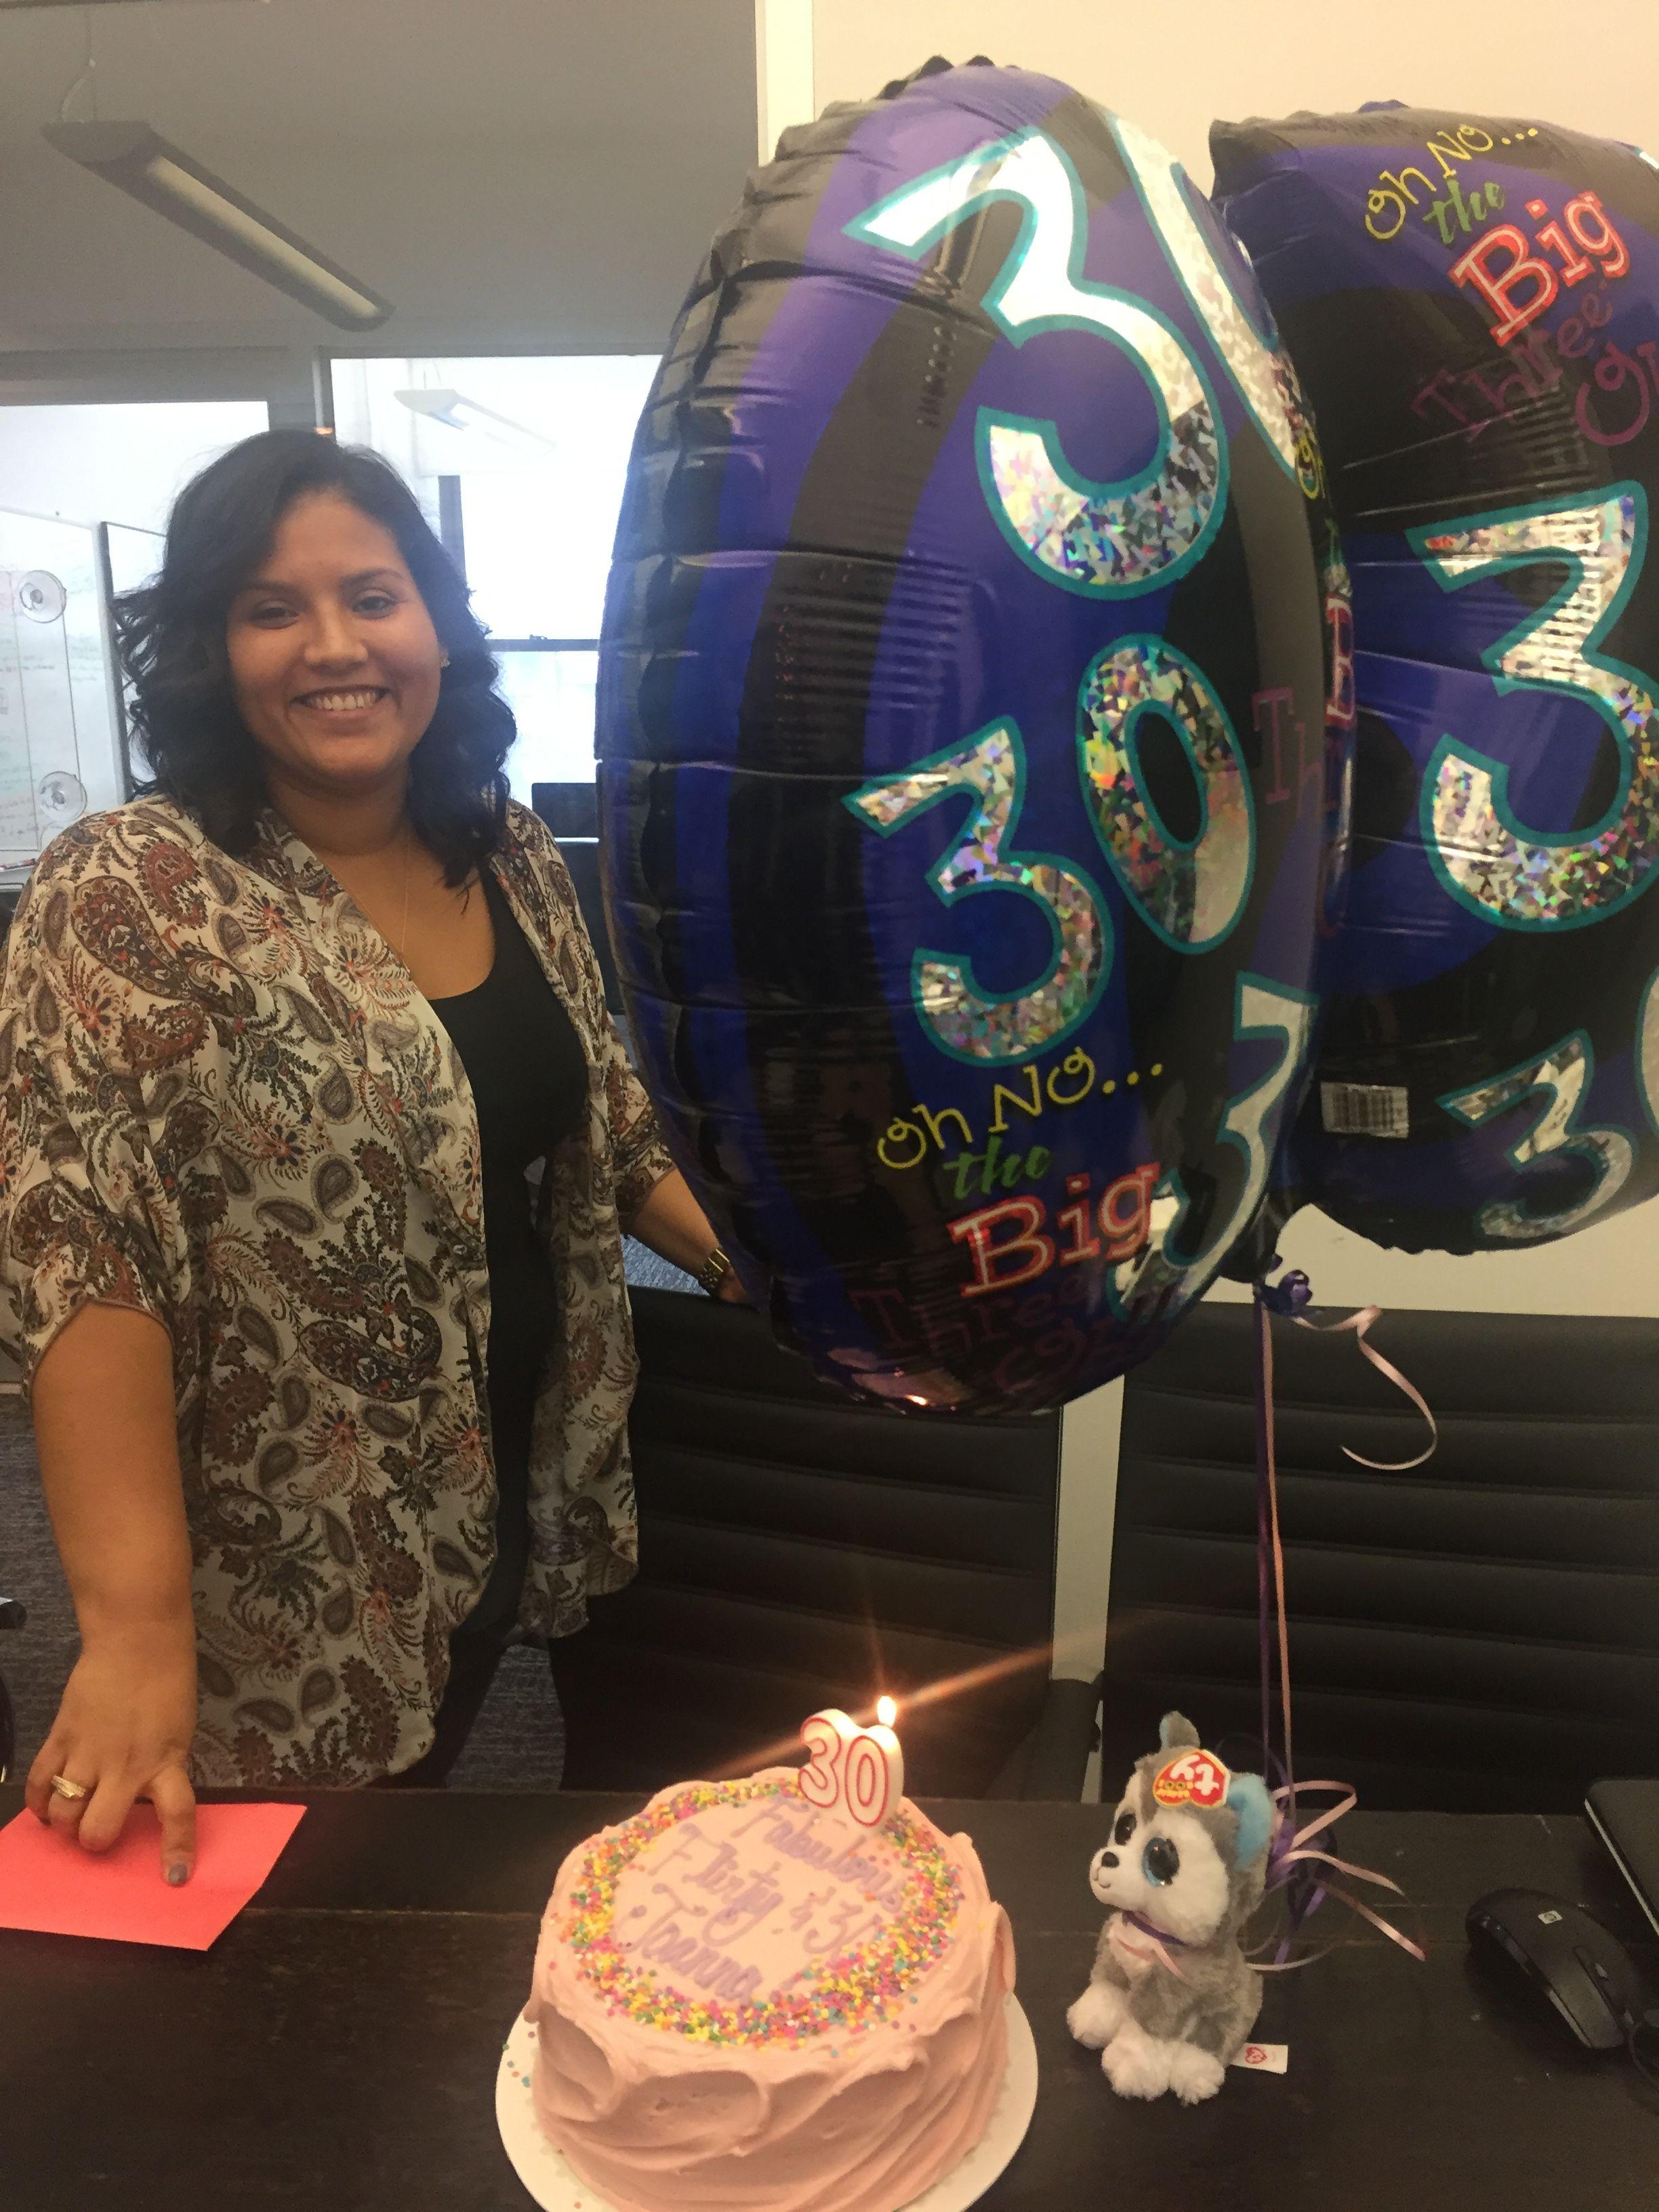 Happy 30th birthday to livings amazing executive